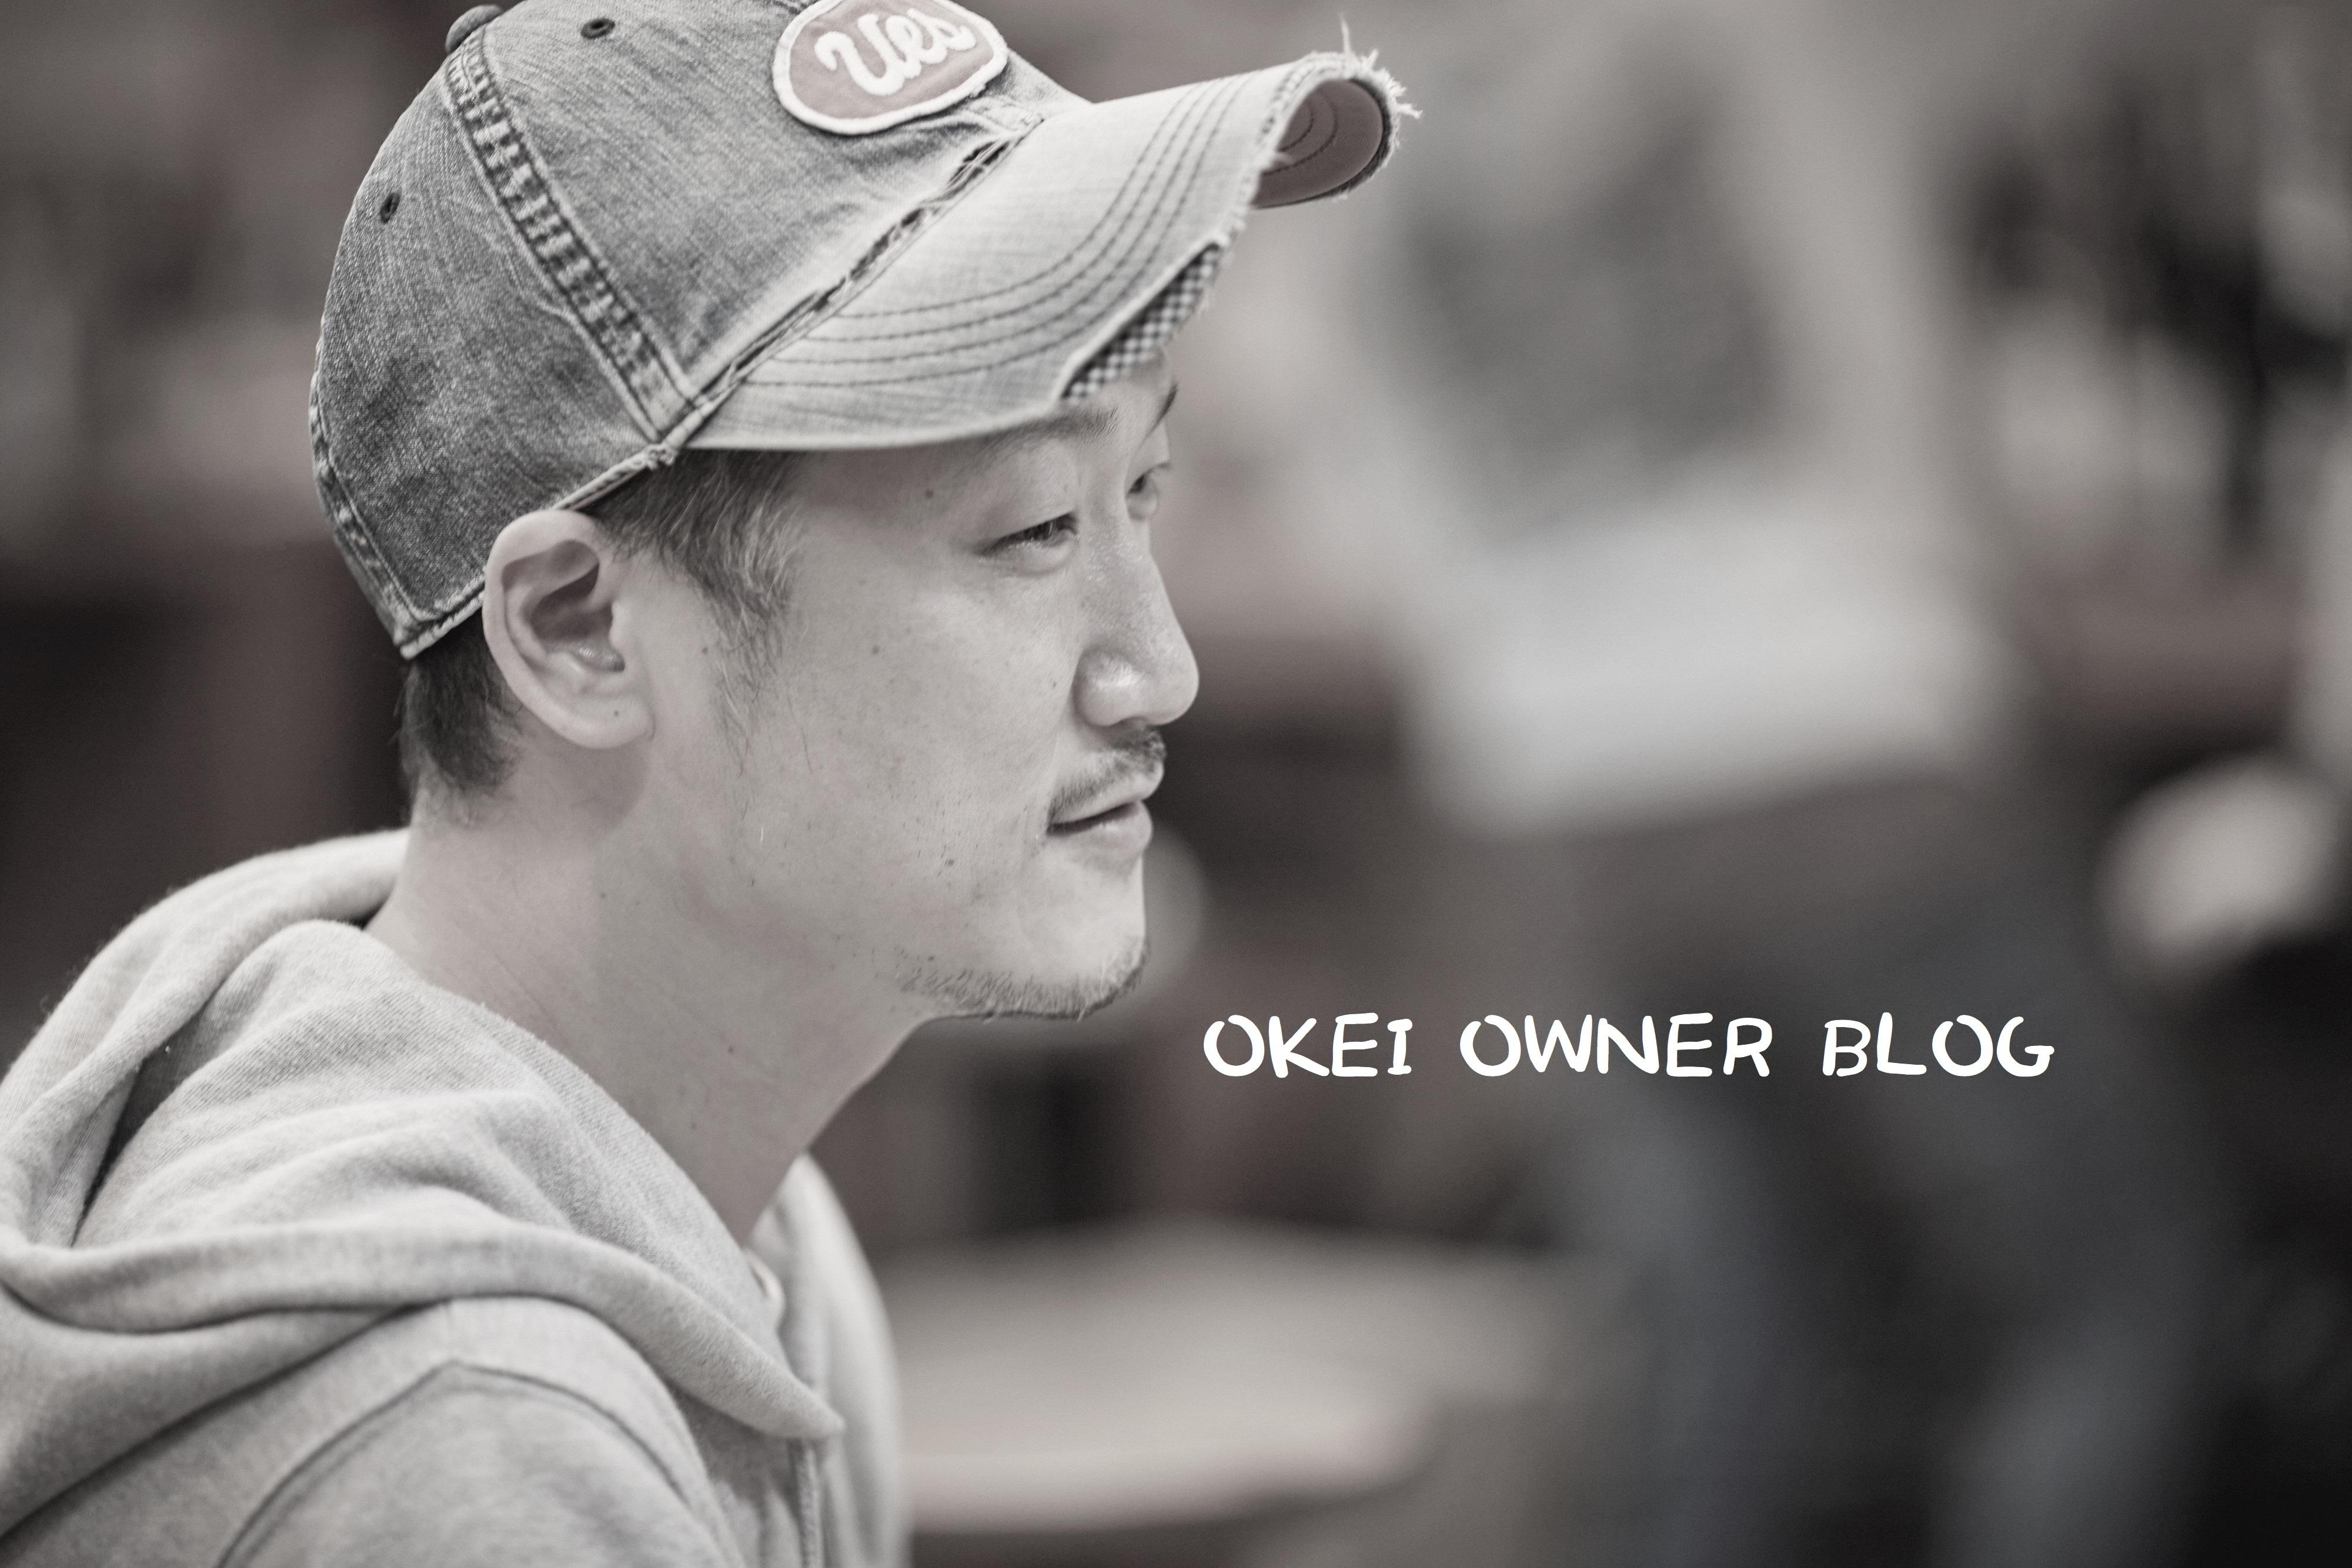 okeiオーナー片寄雄啓のブログ